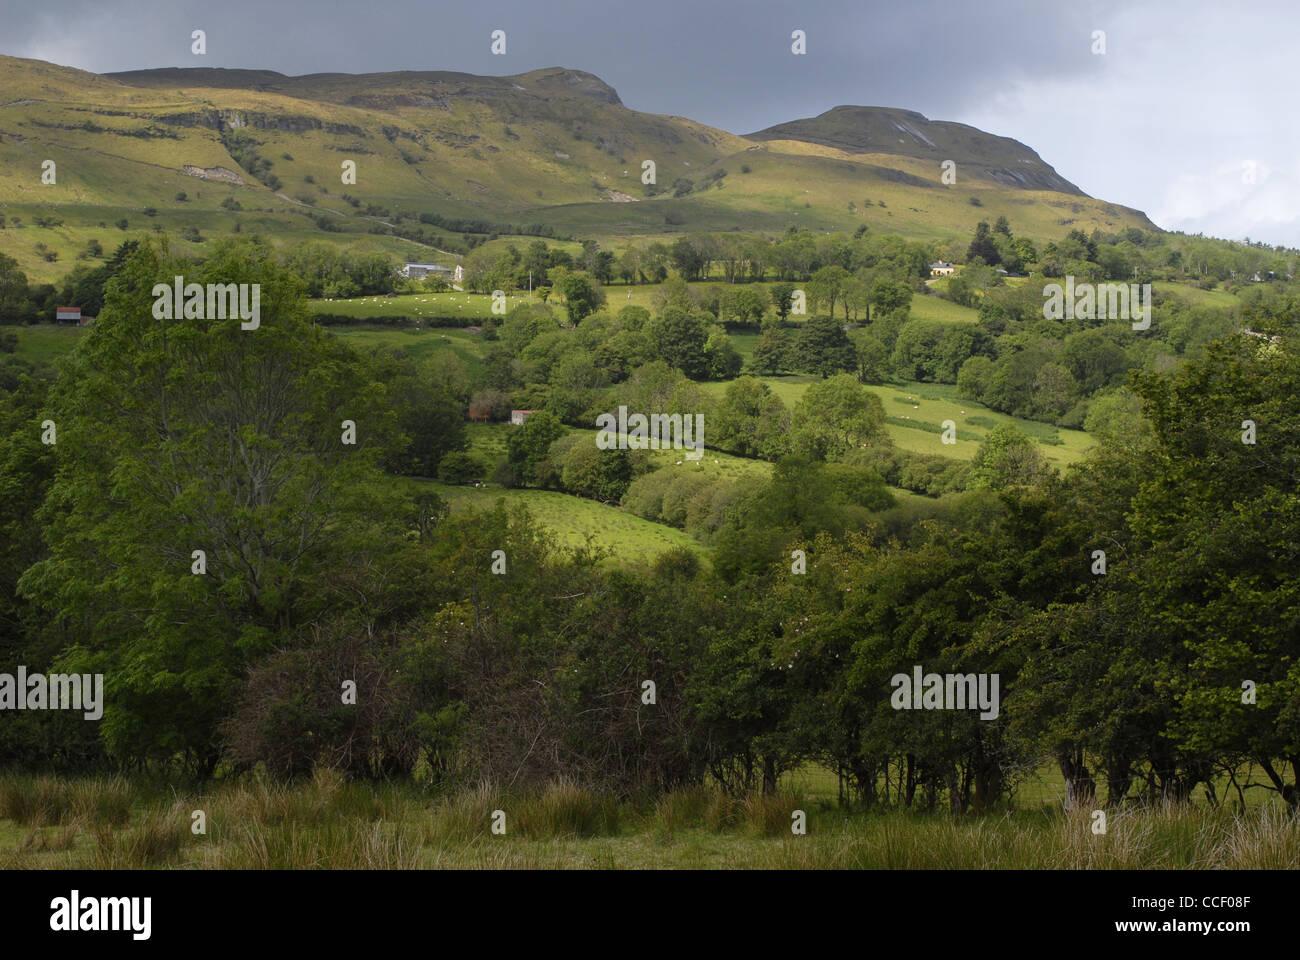 Glencar Valley, County Leitrim, Connacht, Ireland, Europe. - Stock Image